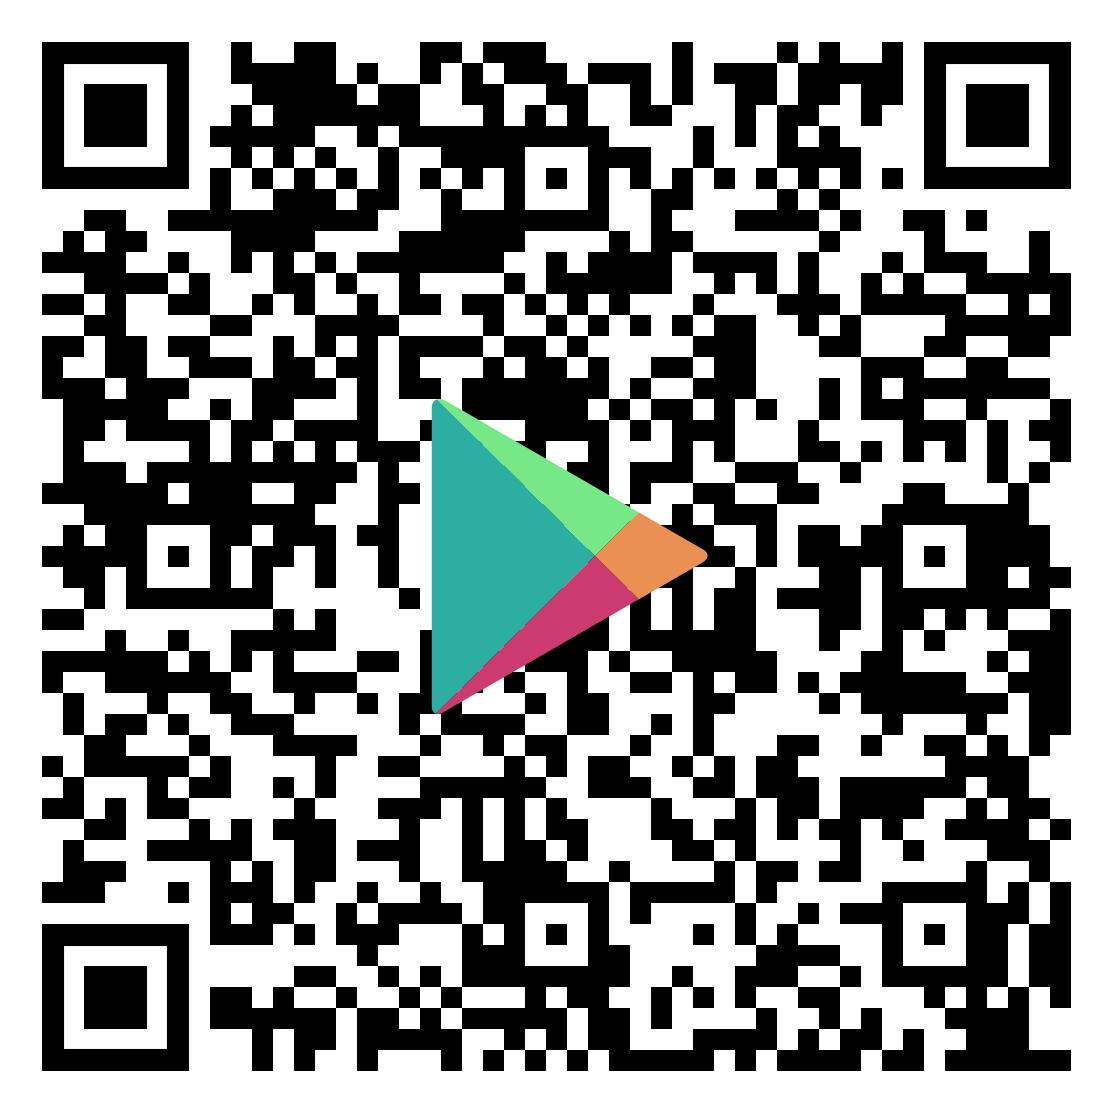 Parent Square Android